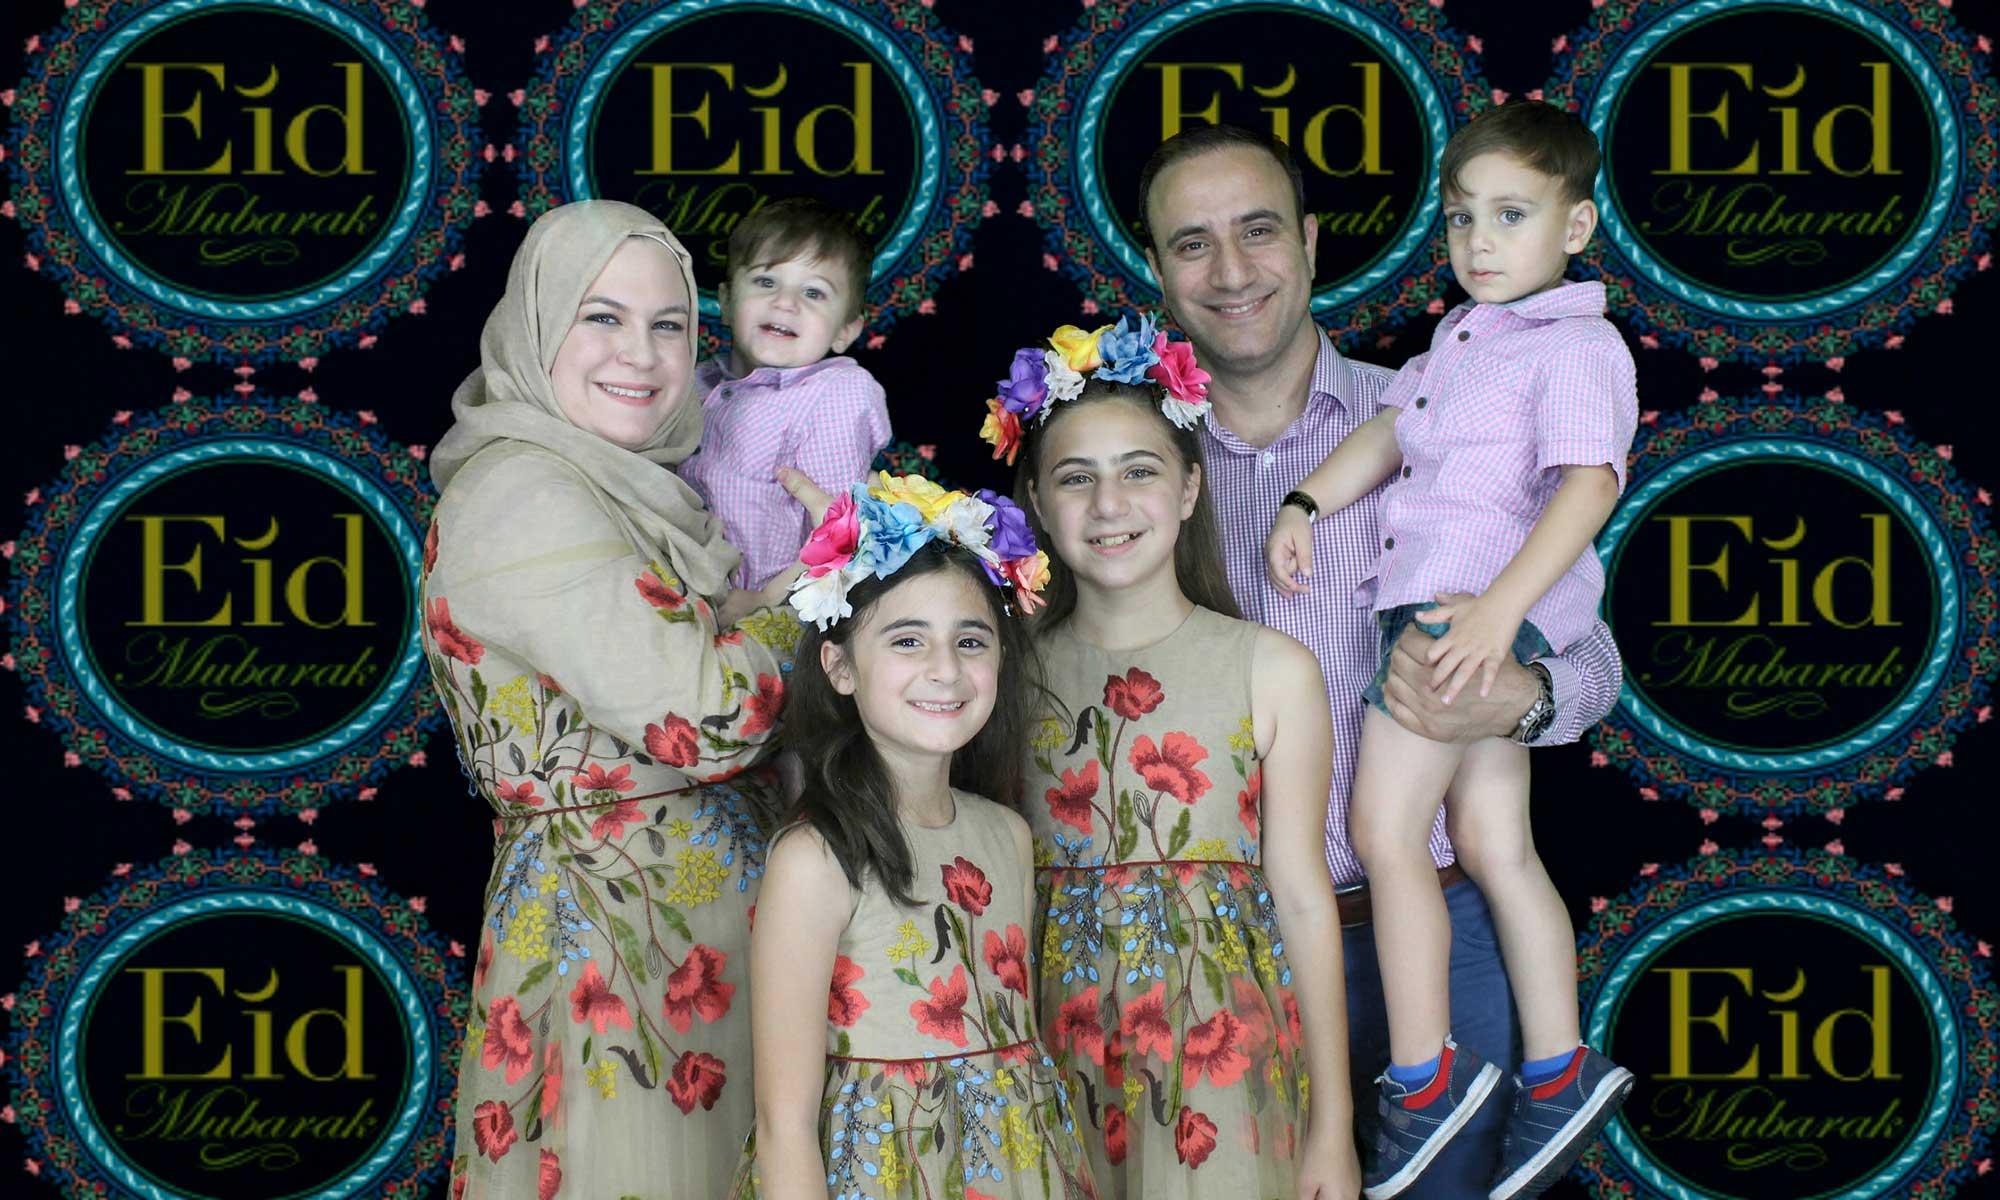 eid mubarak photo booth rental